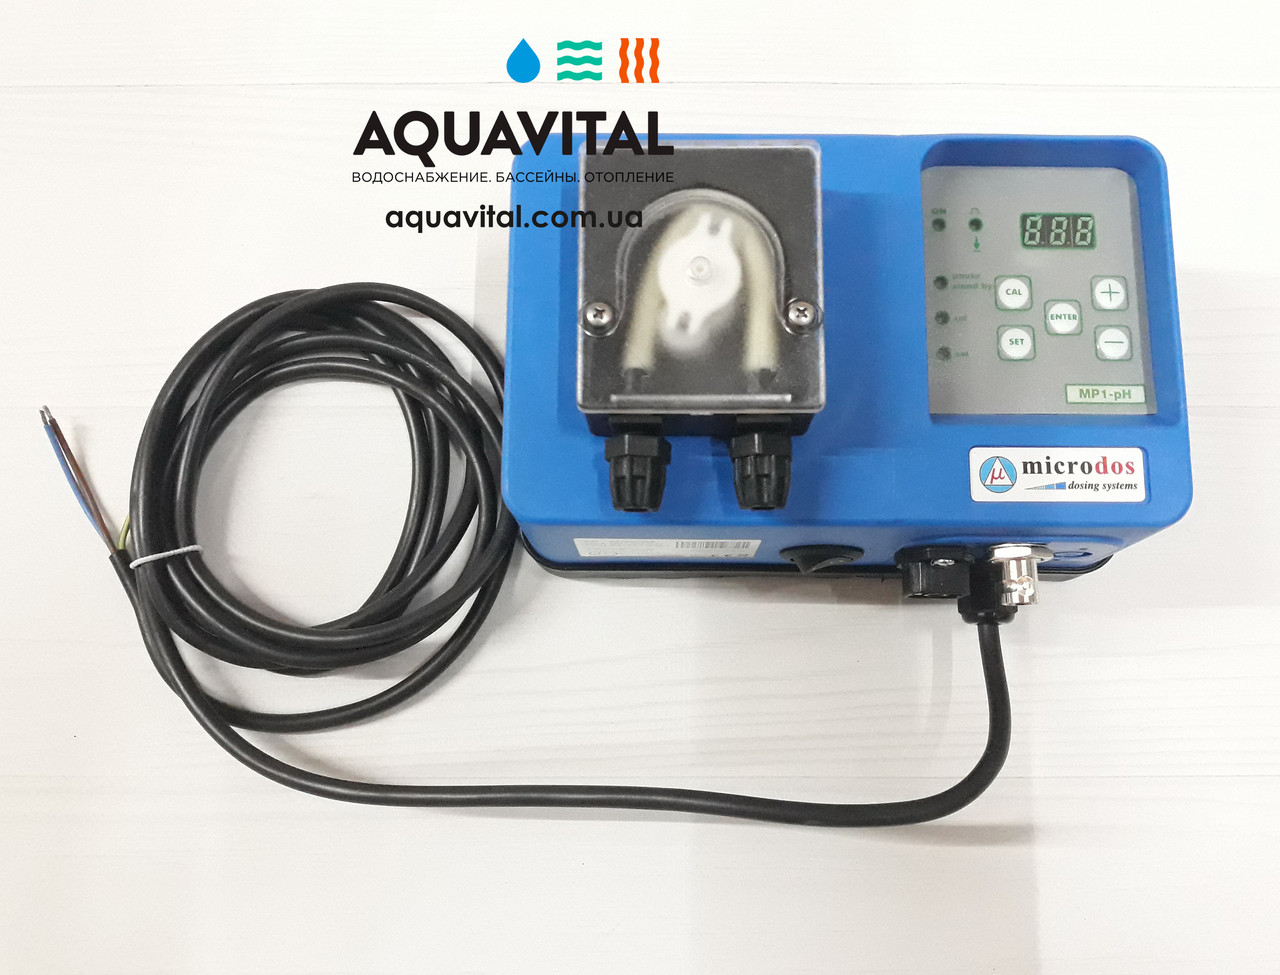 Дозирующая станция Microdos MP1–pH (2,4 л/ч)